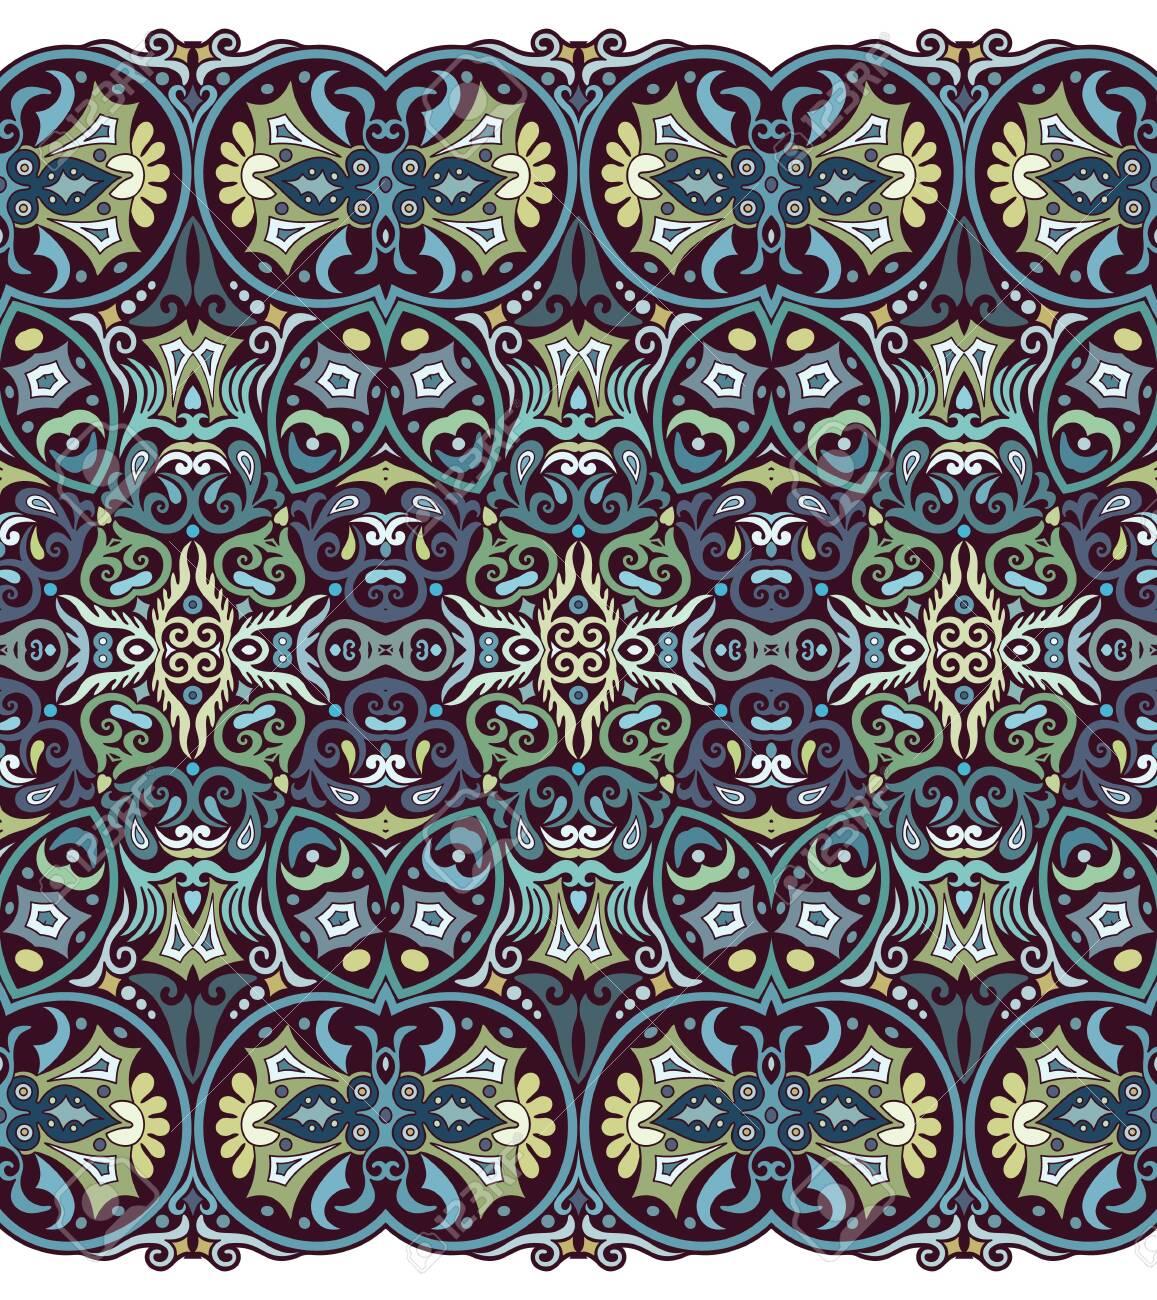 Abstract ethnic nature tile stripe seamless border - 151774601